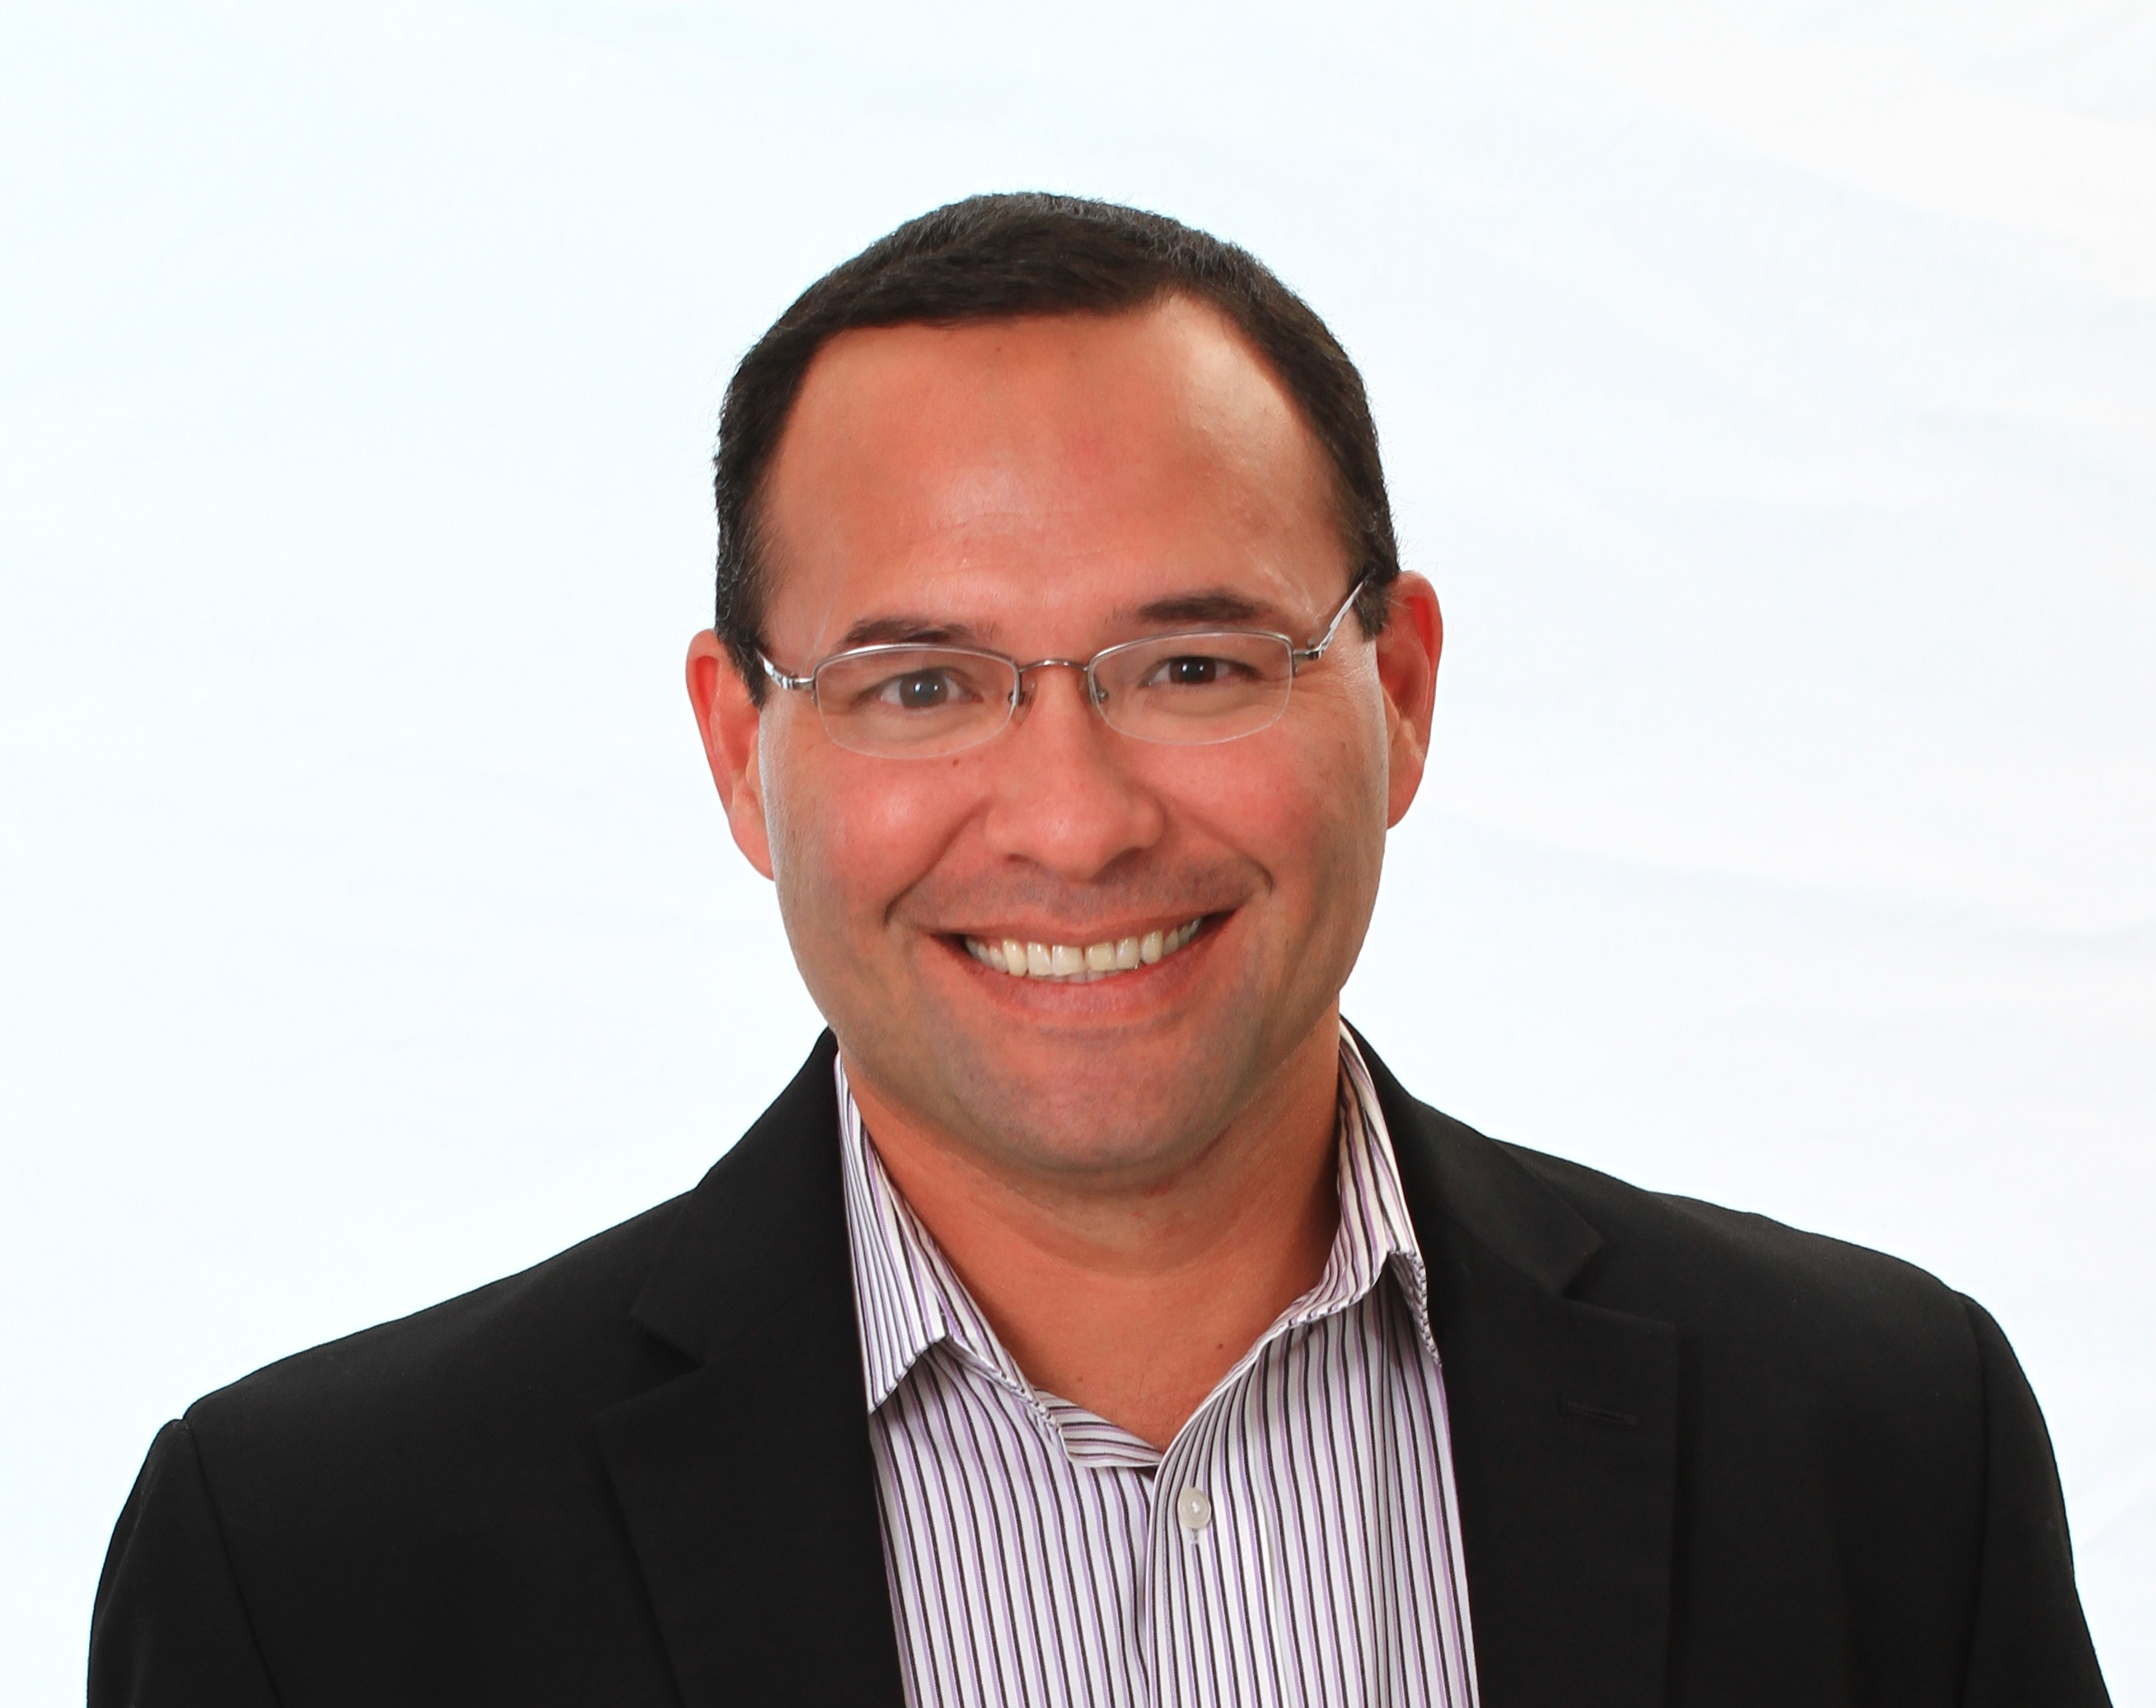 Michael Limtiaco